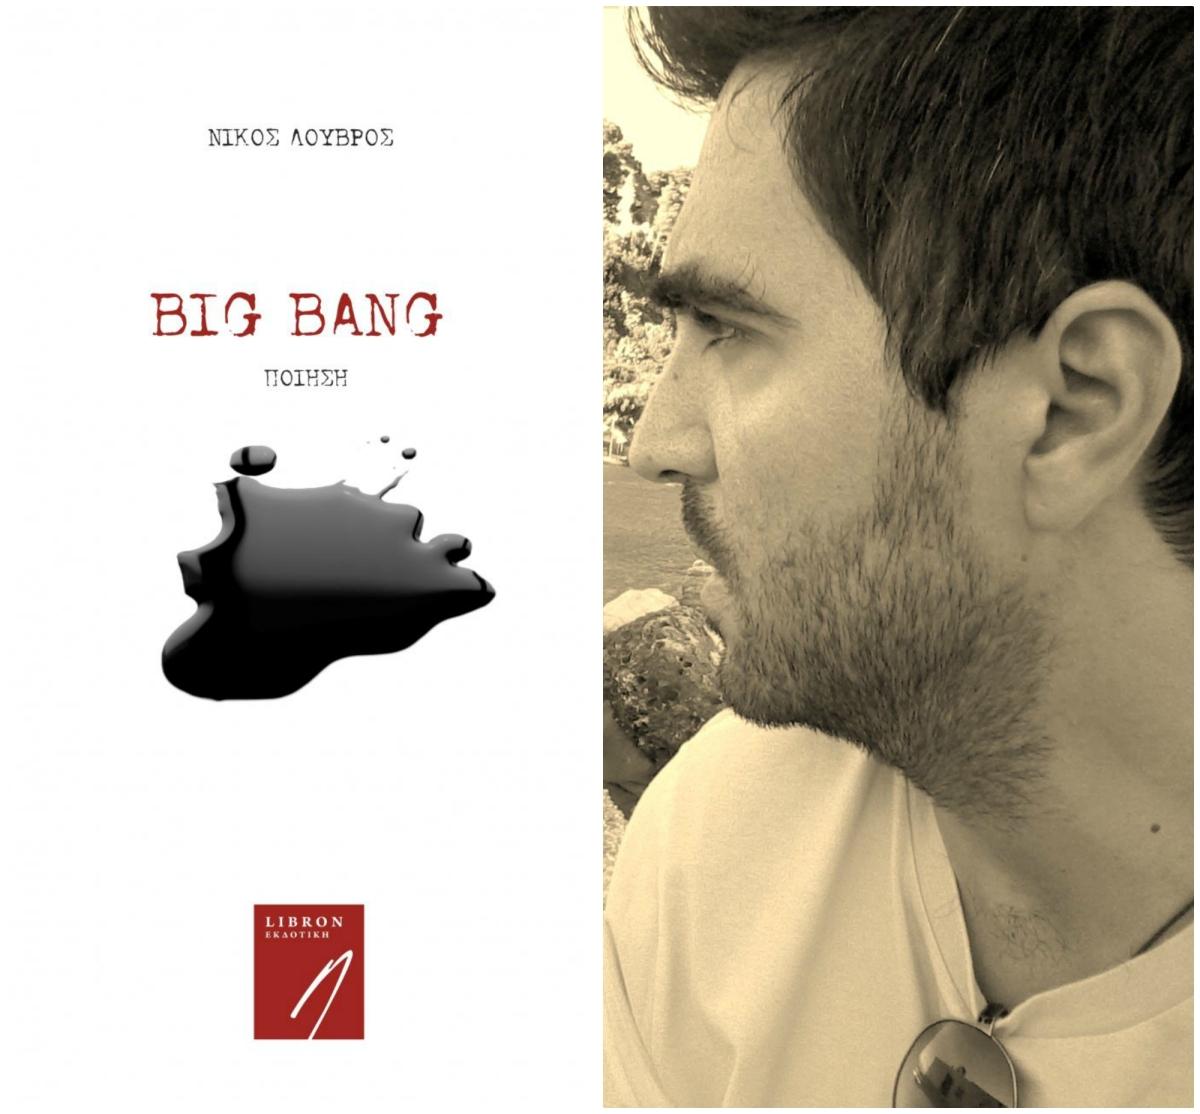 «BIG BANG», του Νίκου Λούβρου | LIBRON Εκδοτική